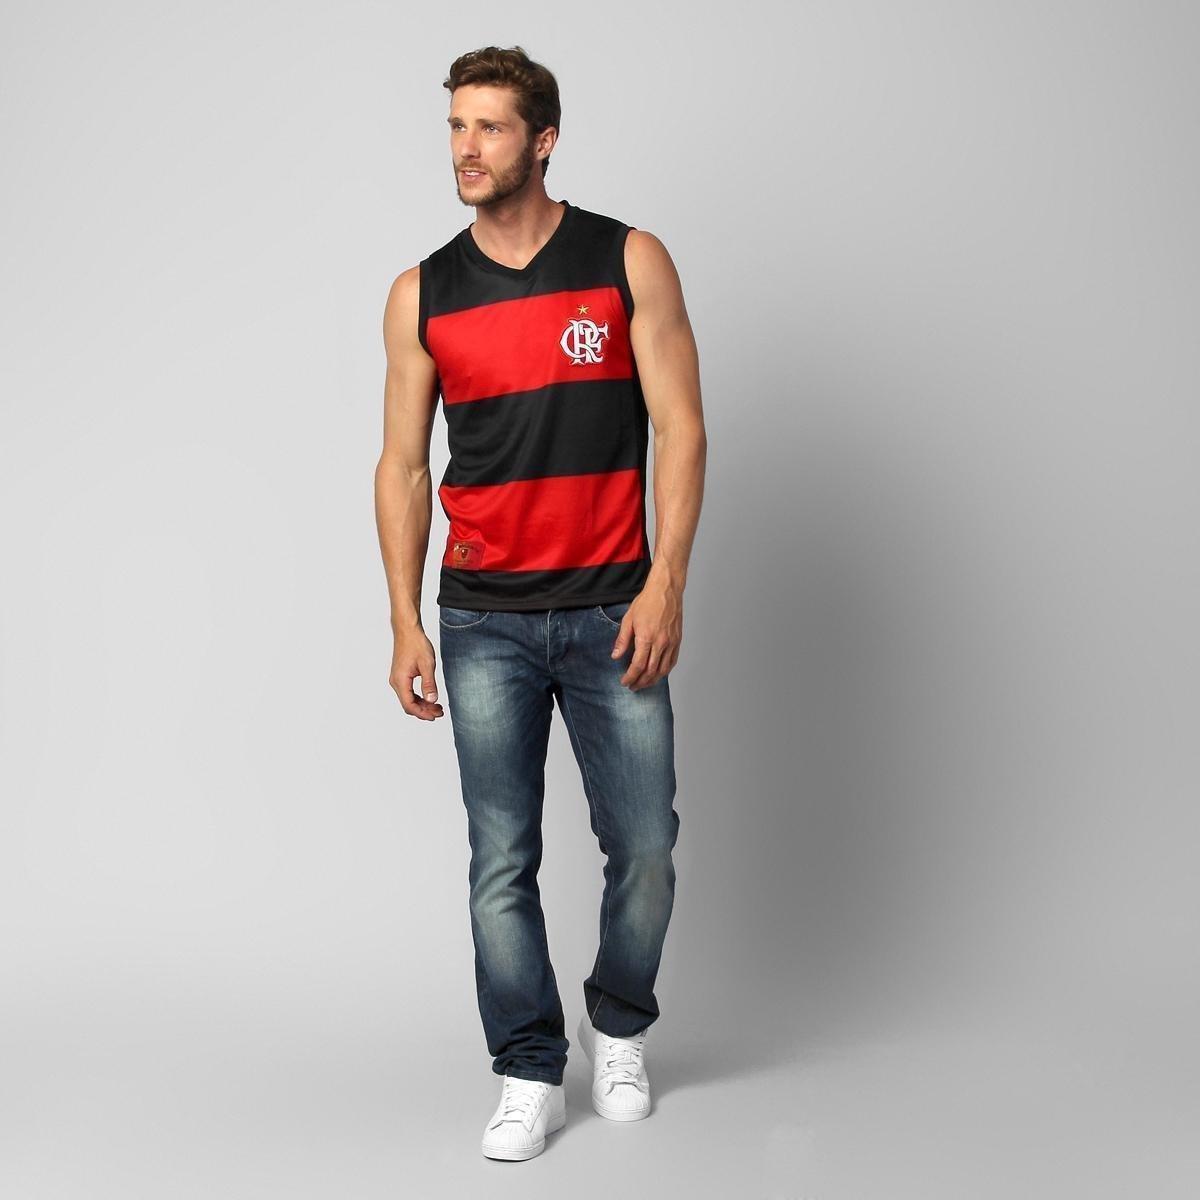 db9ac31f12 ... Camiseta Regata Flamengo Hoop - Compre Agora Netshoes fa979dae89945d ...